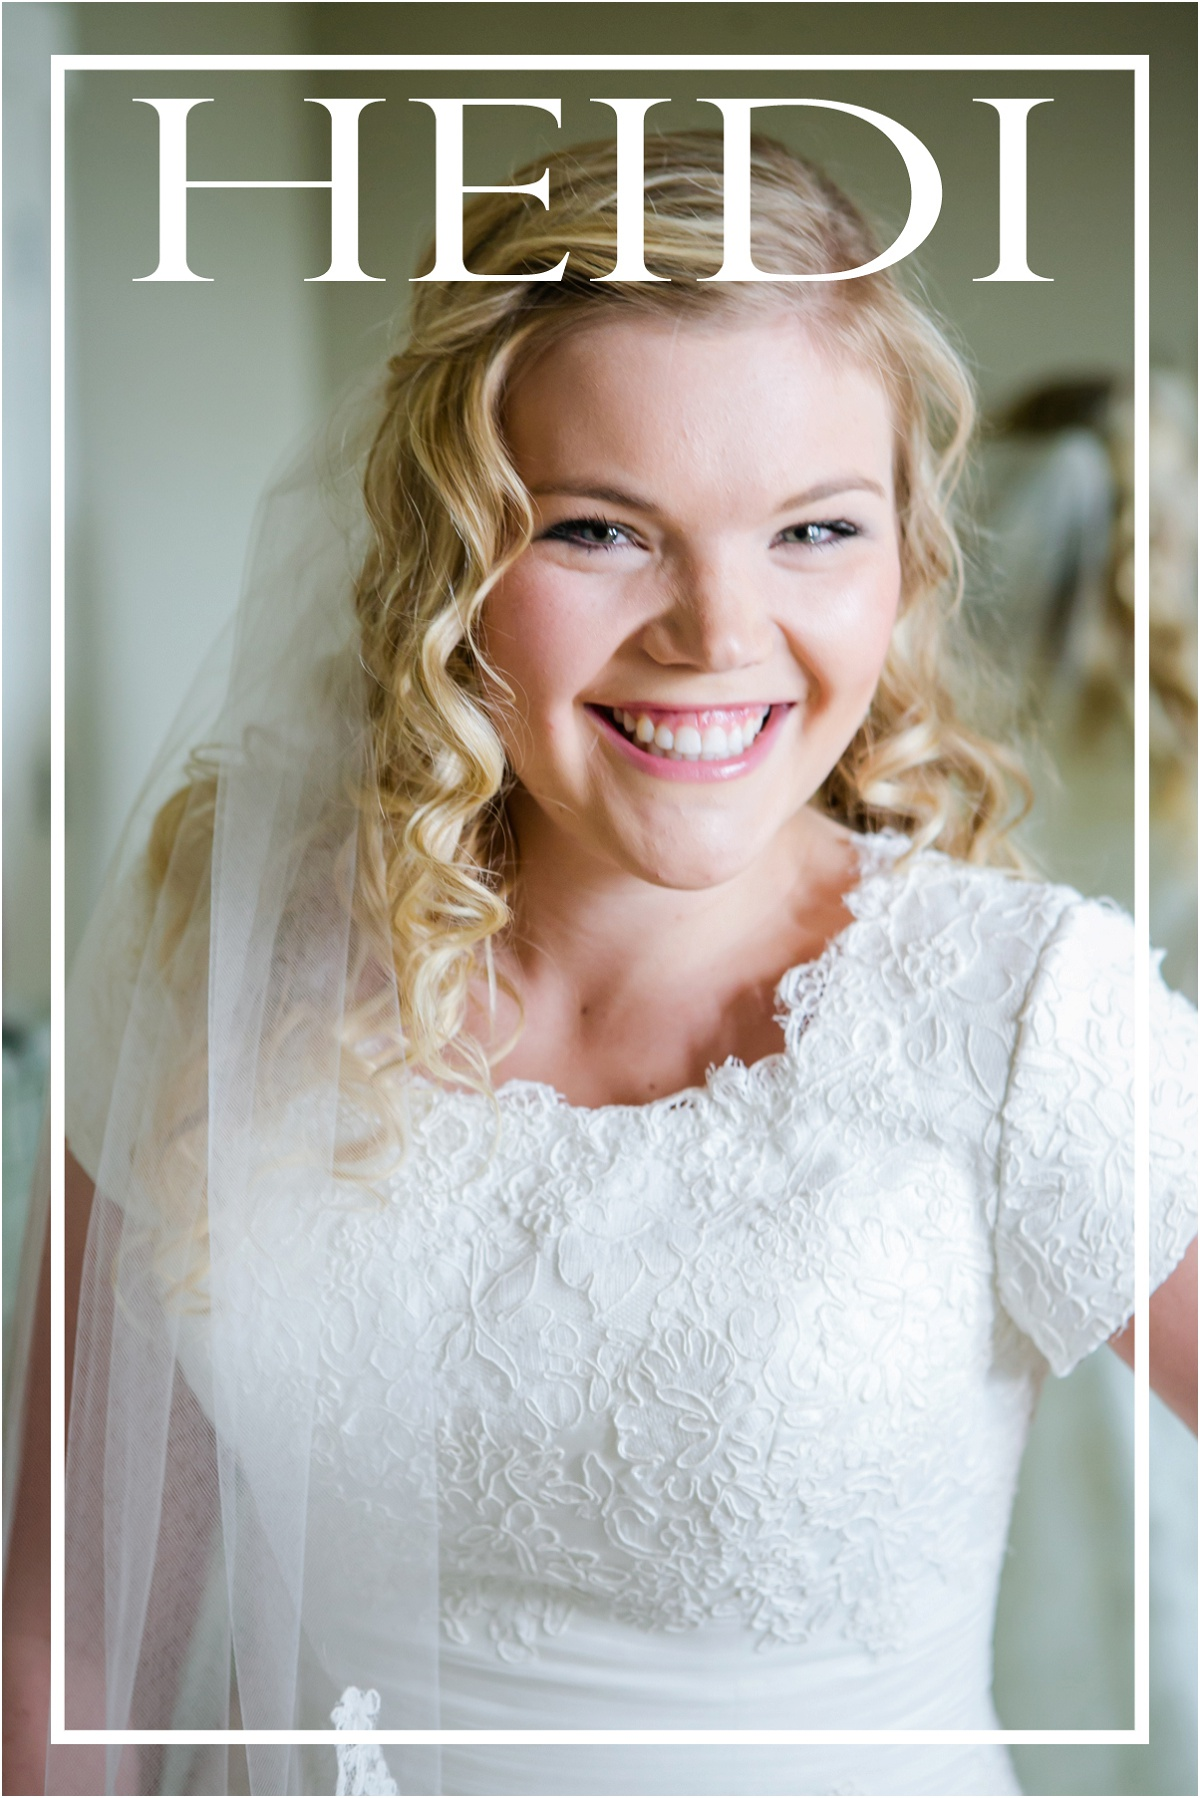 Terra Cooper Photography Weddings Brides 2015_5403.jpg